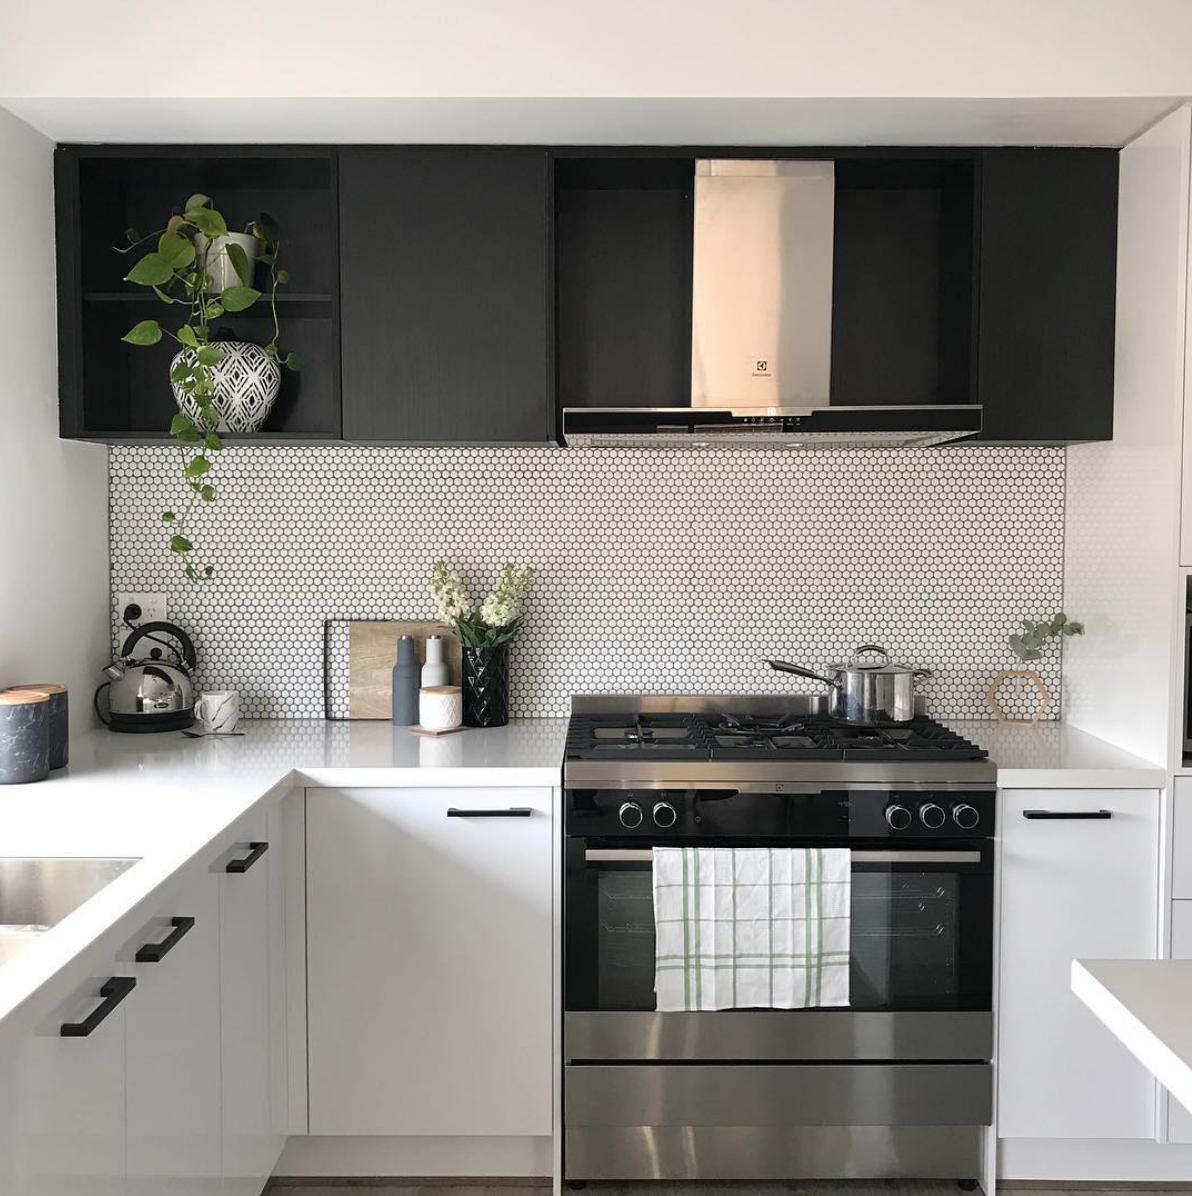 Credence Cuisine Carrelage: 11 Types Of White Kitchen Splashback Tiles: Add Interest